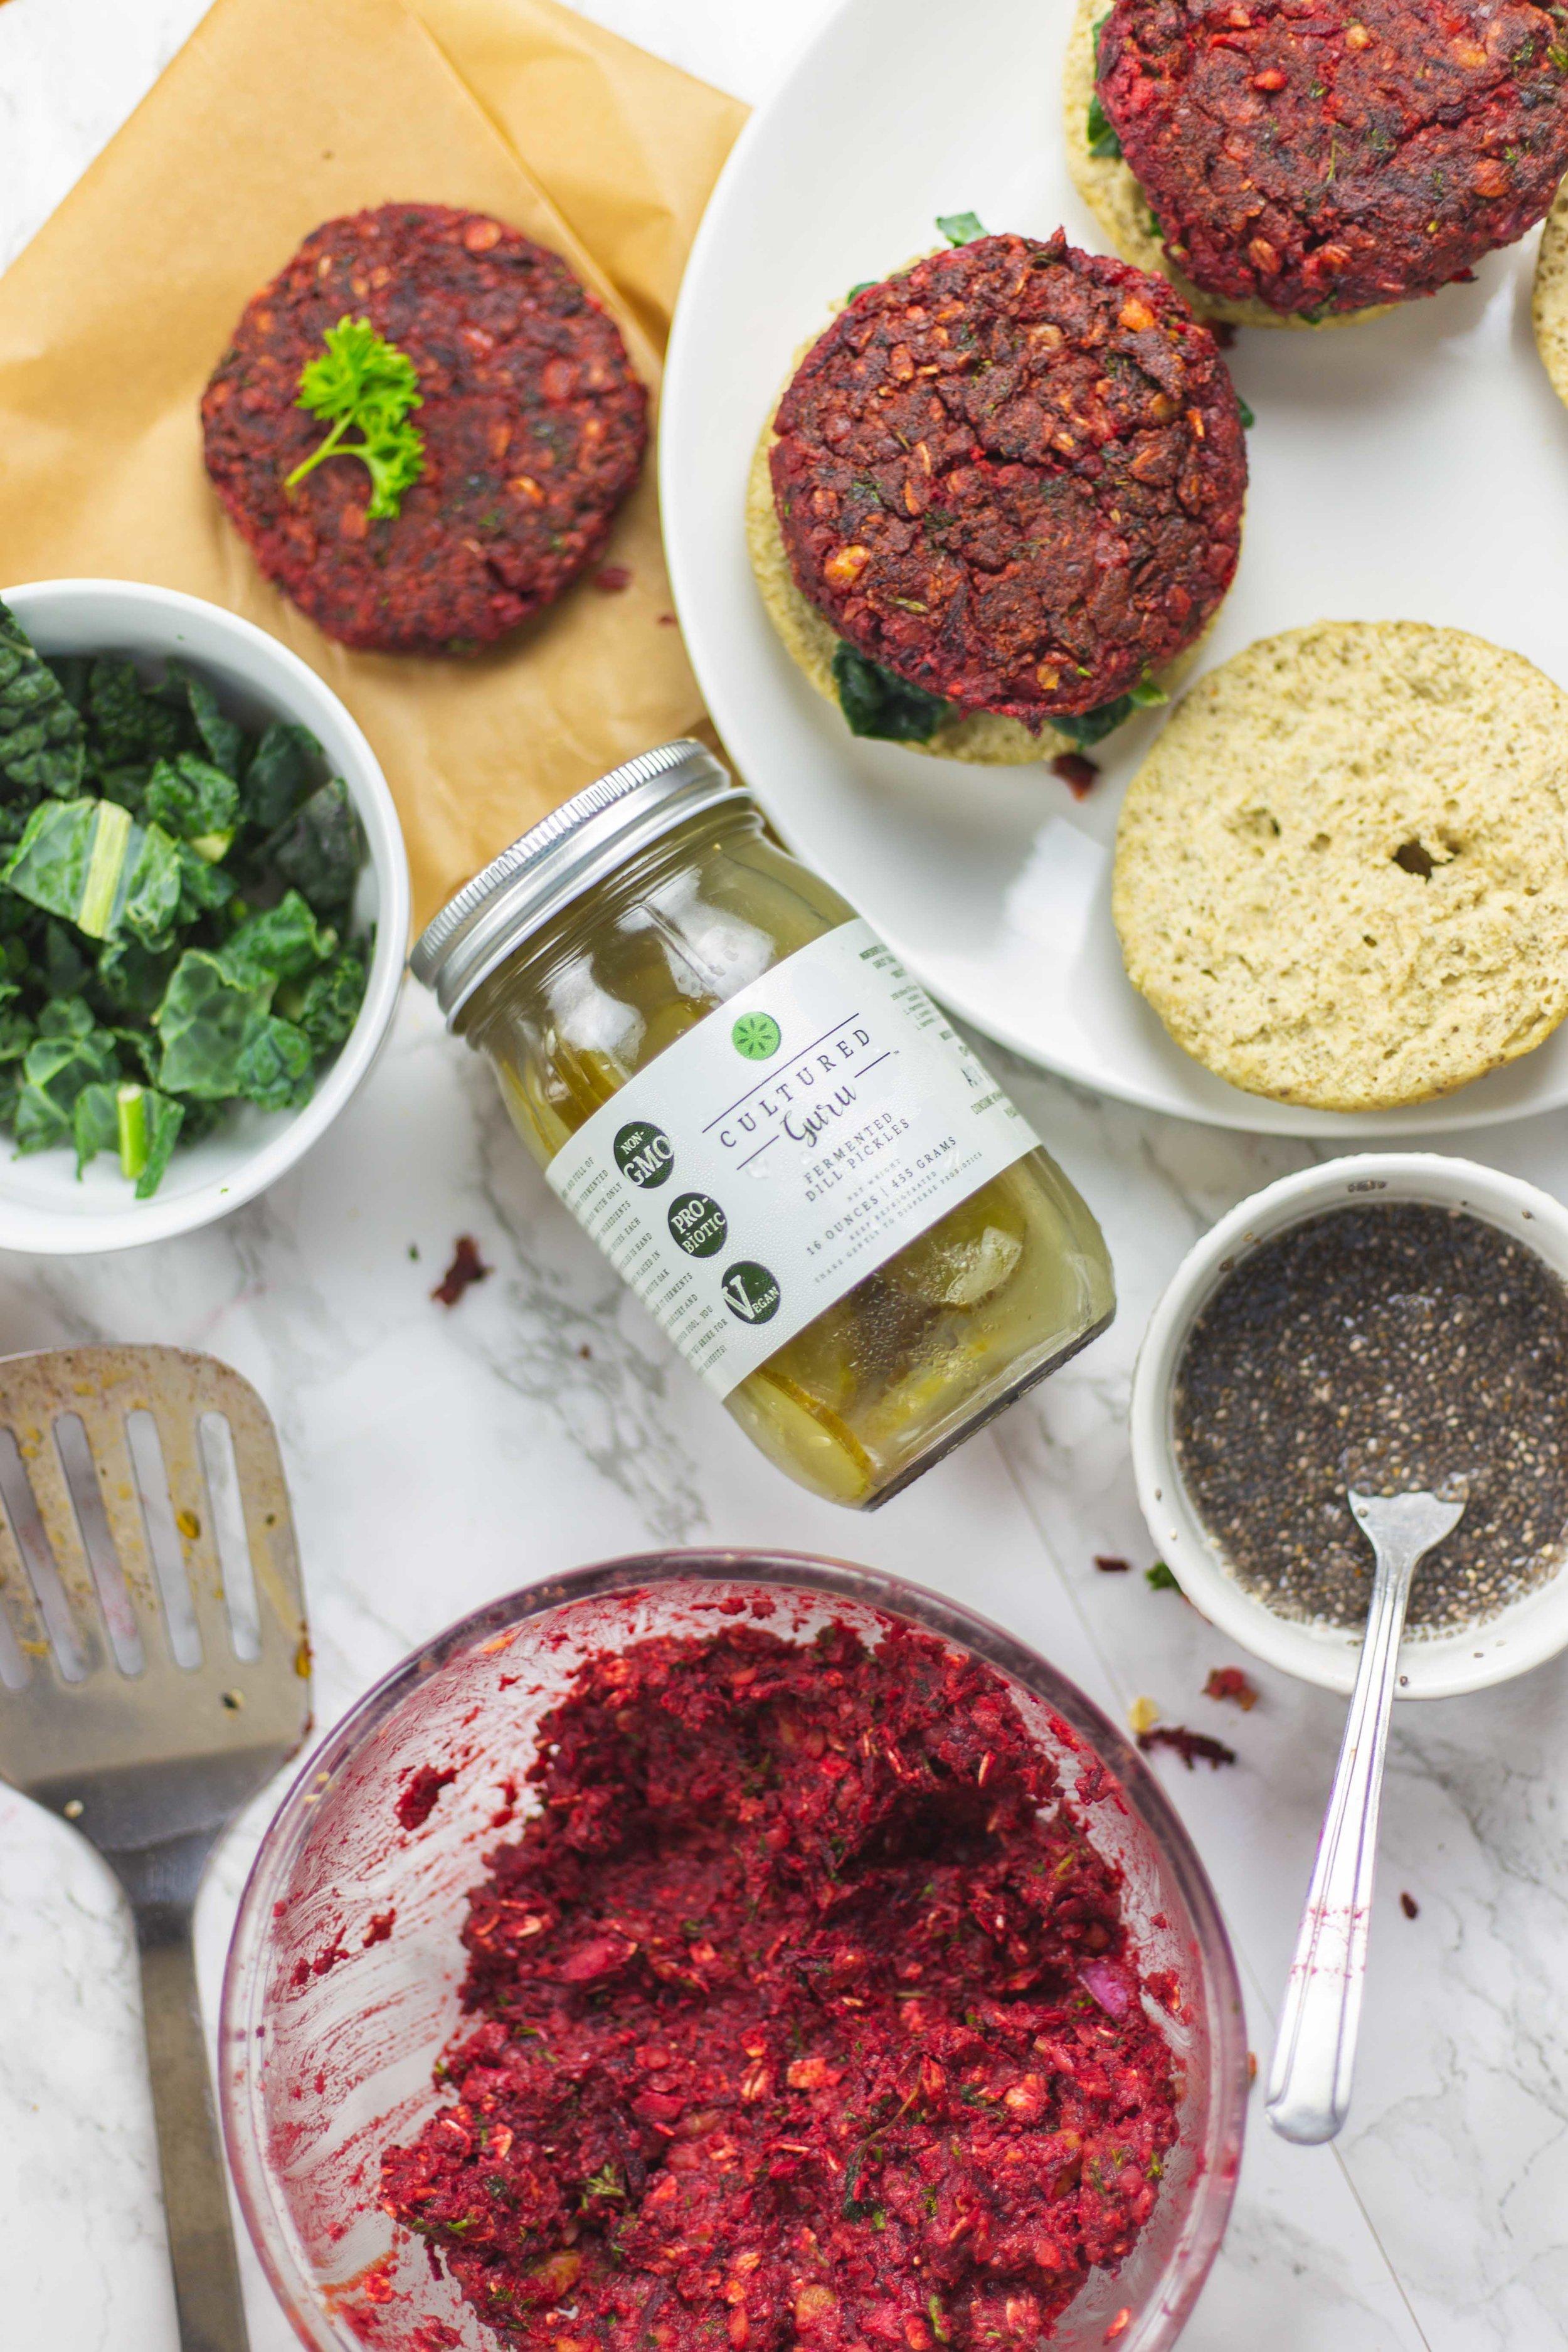 Vegan Beet Burger Recipe | The Ultimate Grillable Vegan Burgers with Fermented Pickles